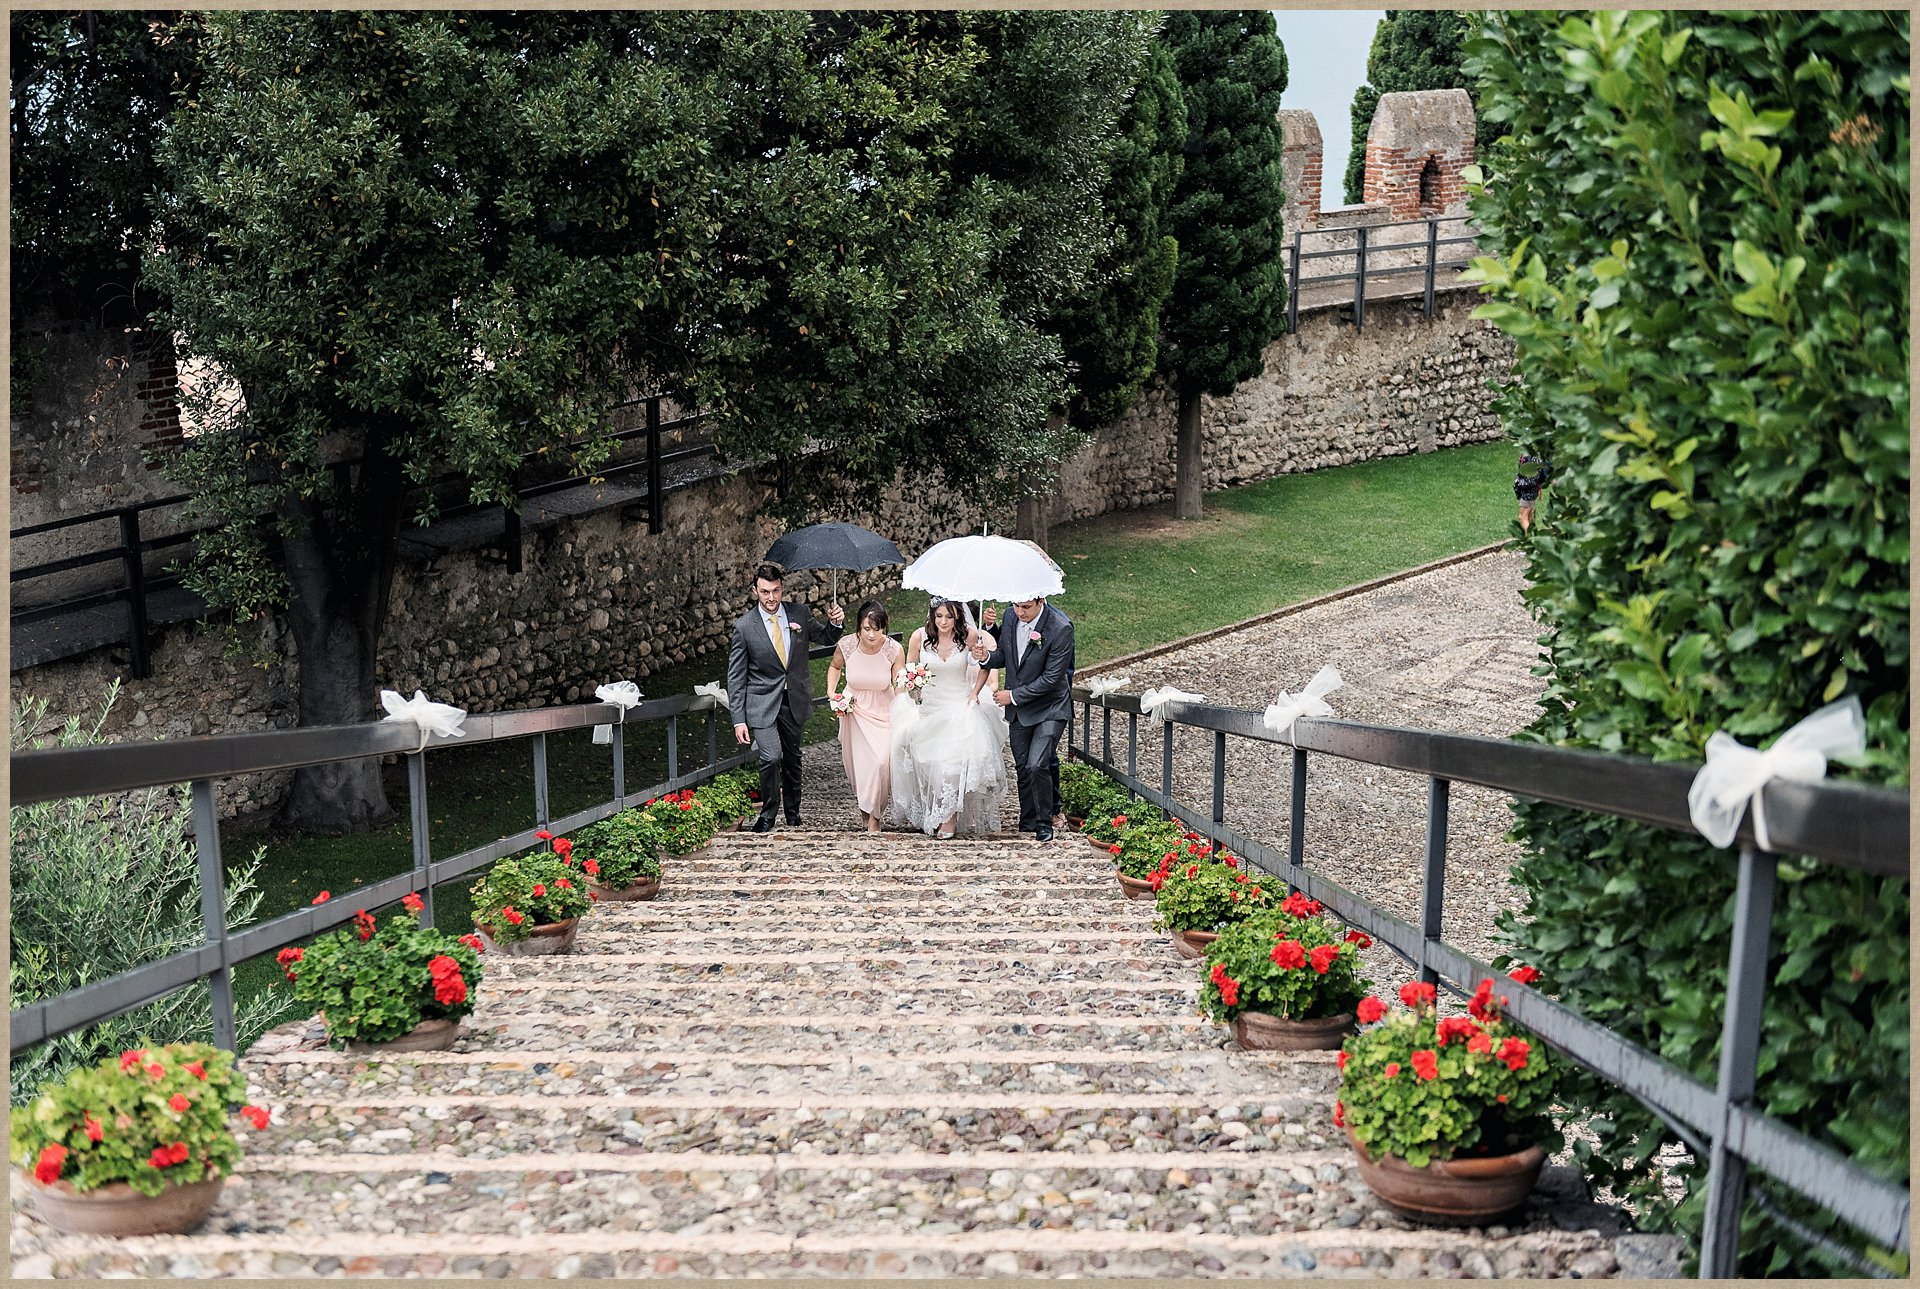 Malcesine castle wedding - steps up to castle ceremony